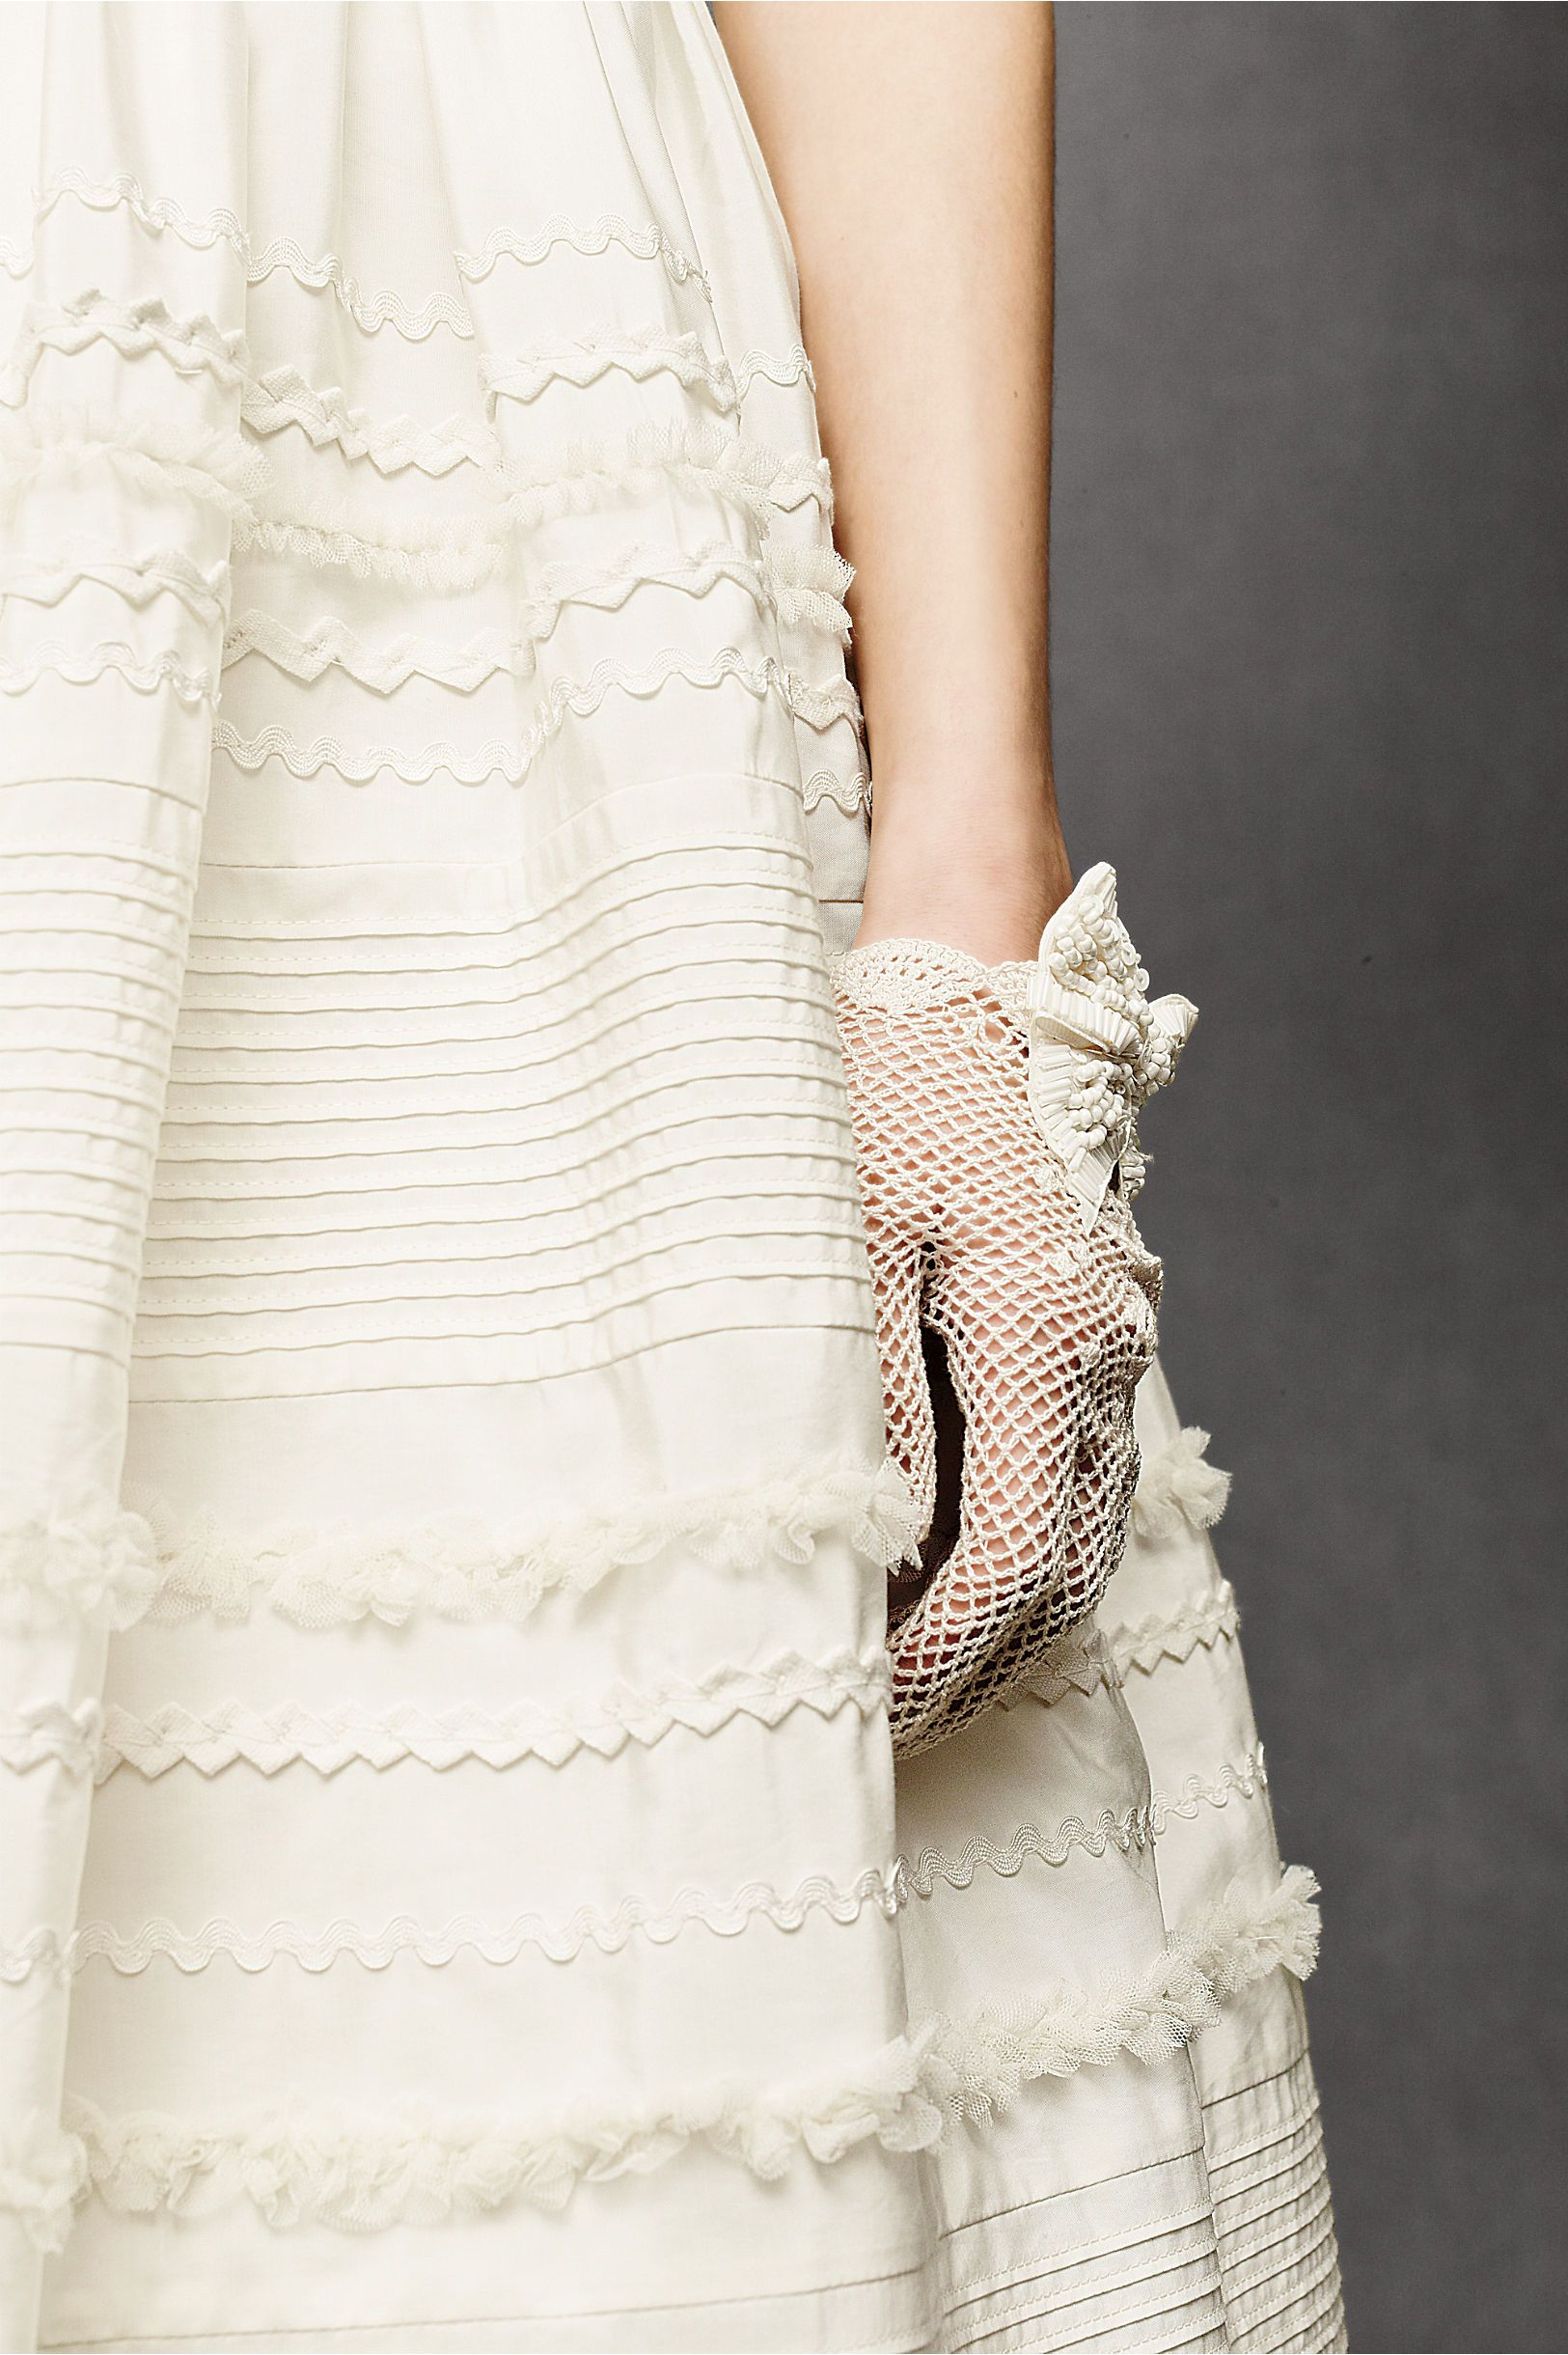 Cream dresses for weddings  Fondant Tea Dress in SHOP The Bride Wedding Dresses at BHLDN